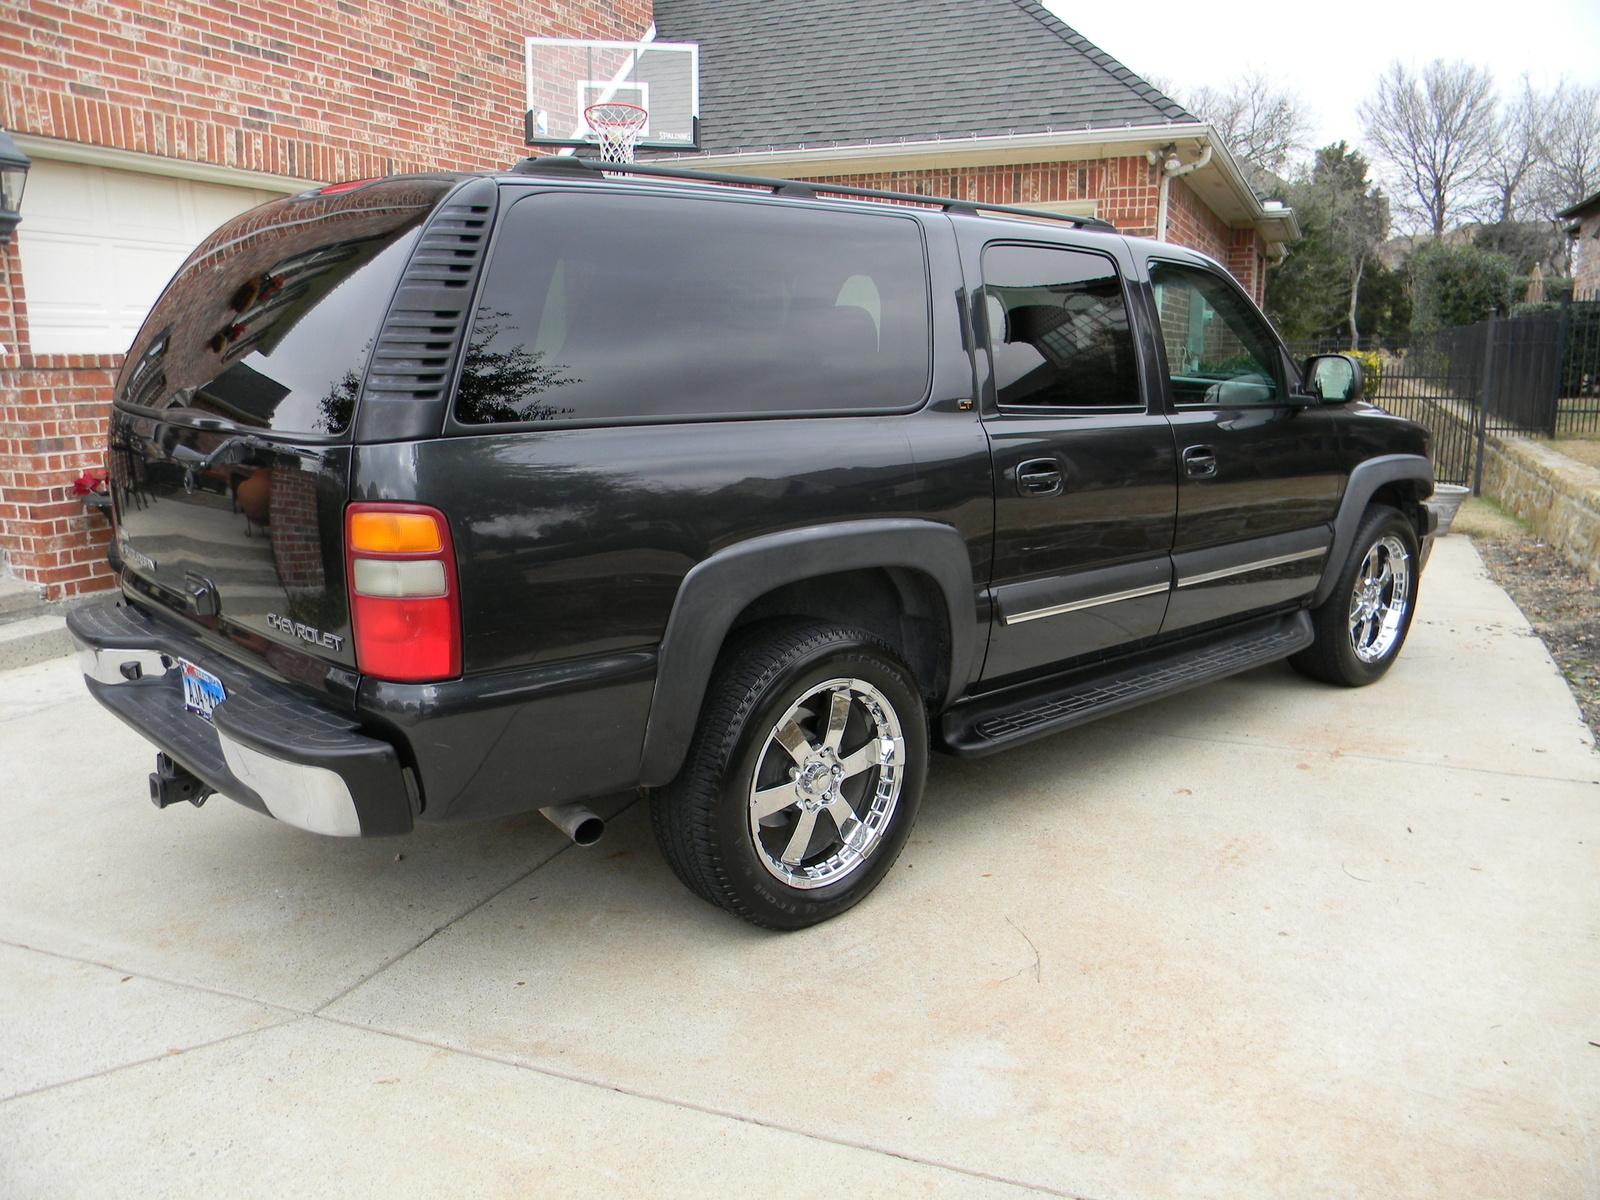 2003 Chevrolet Suburban - Exterior Pictures